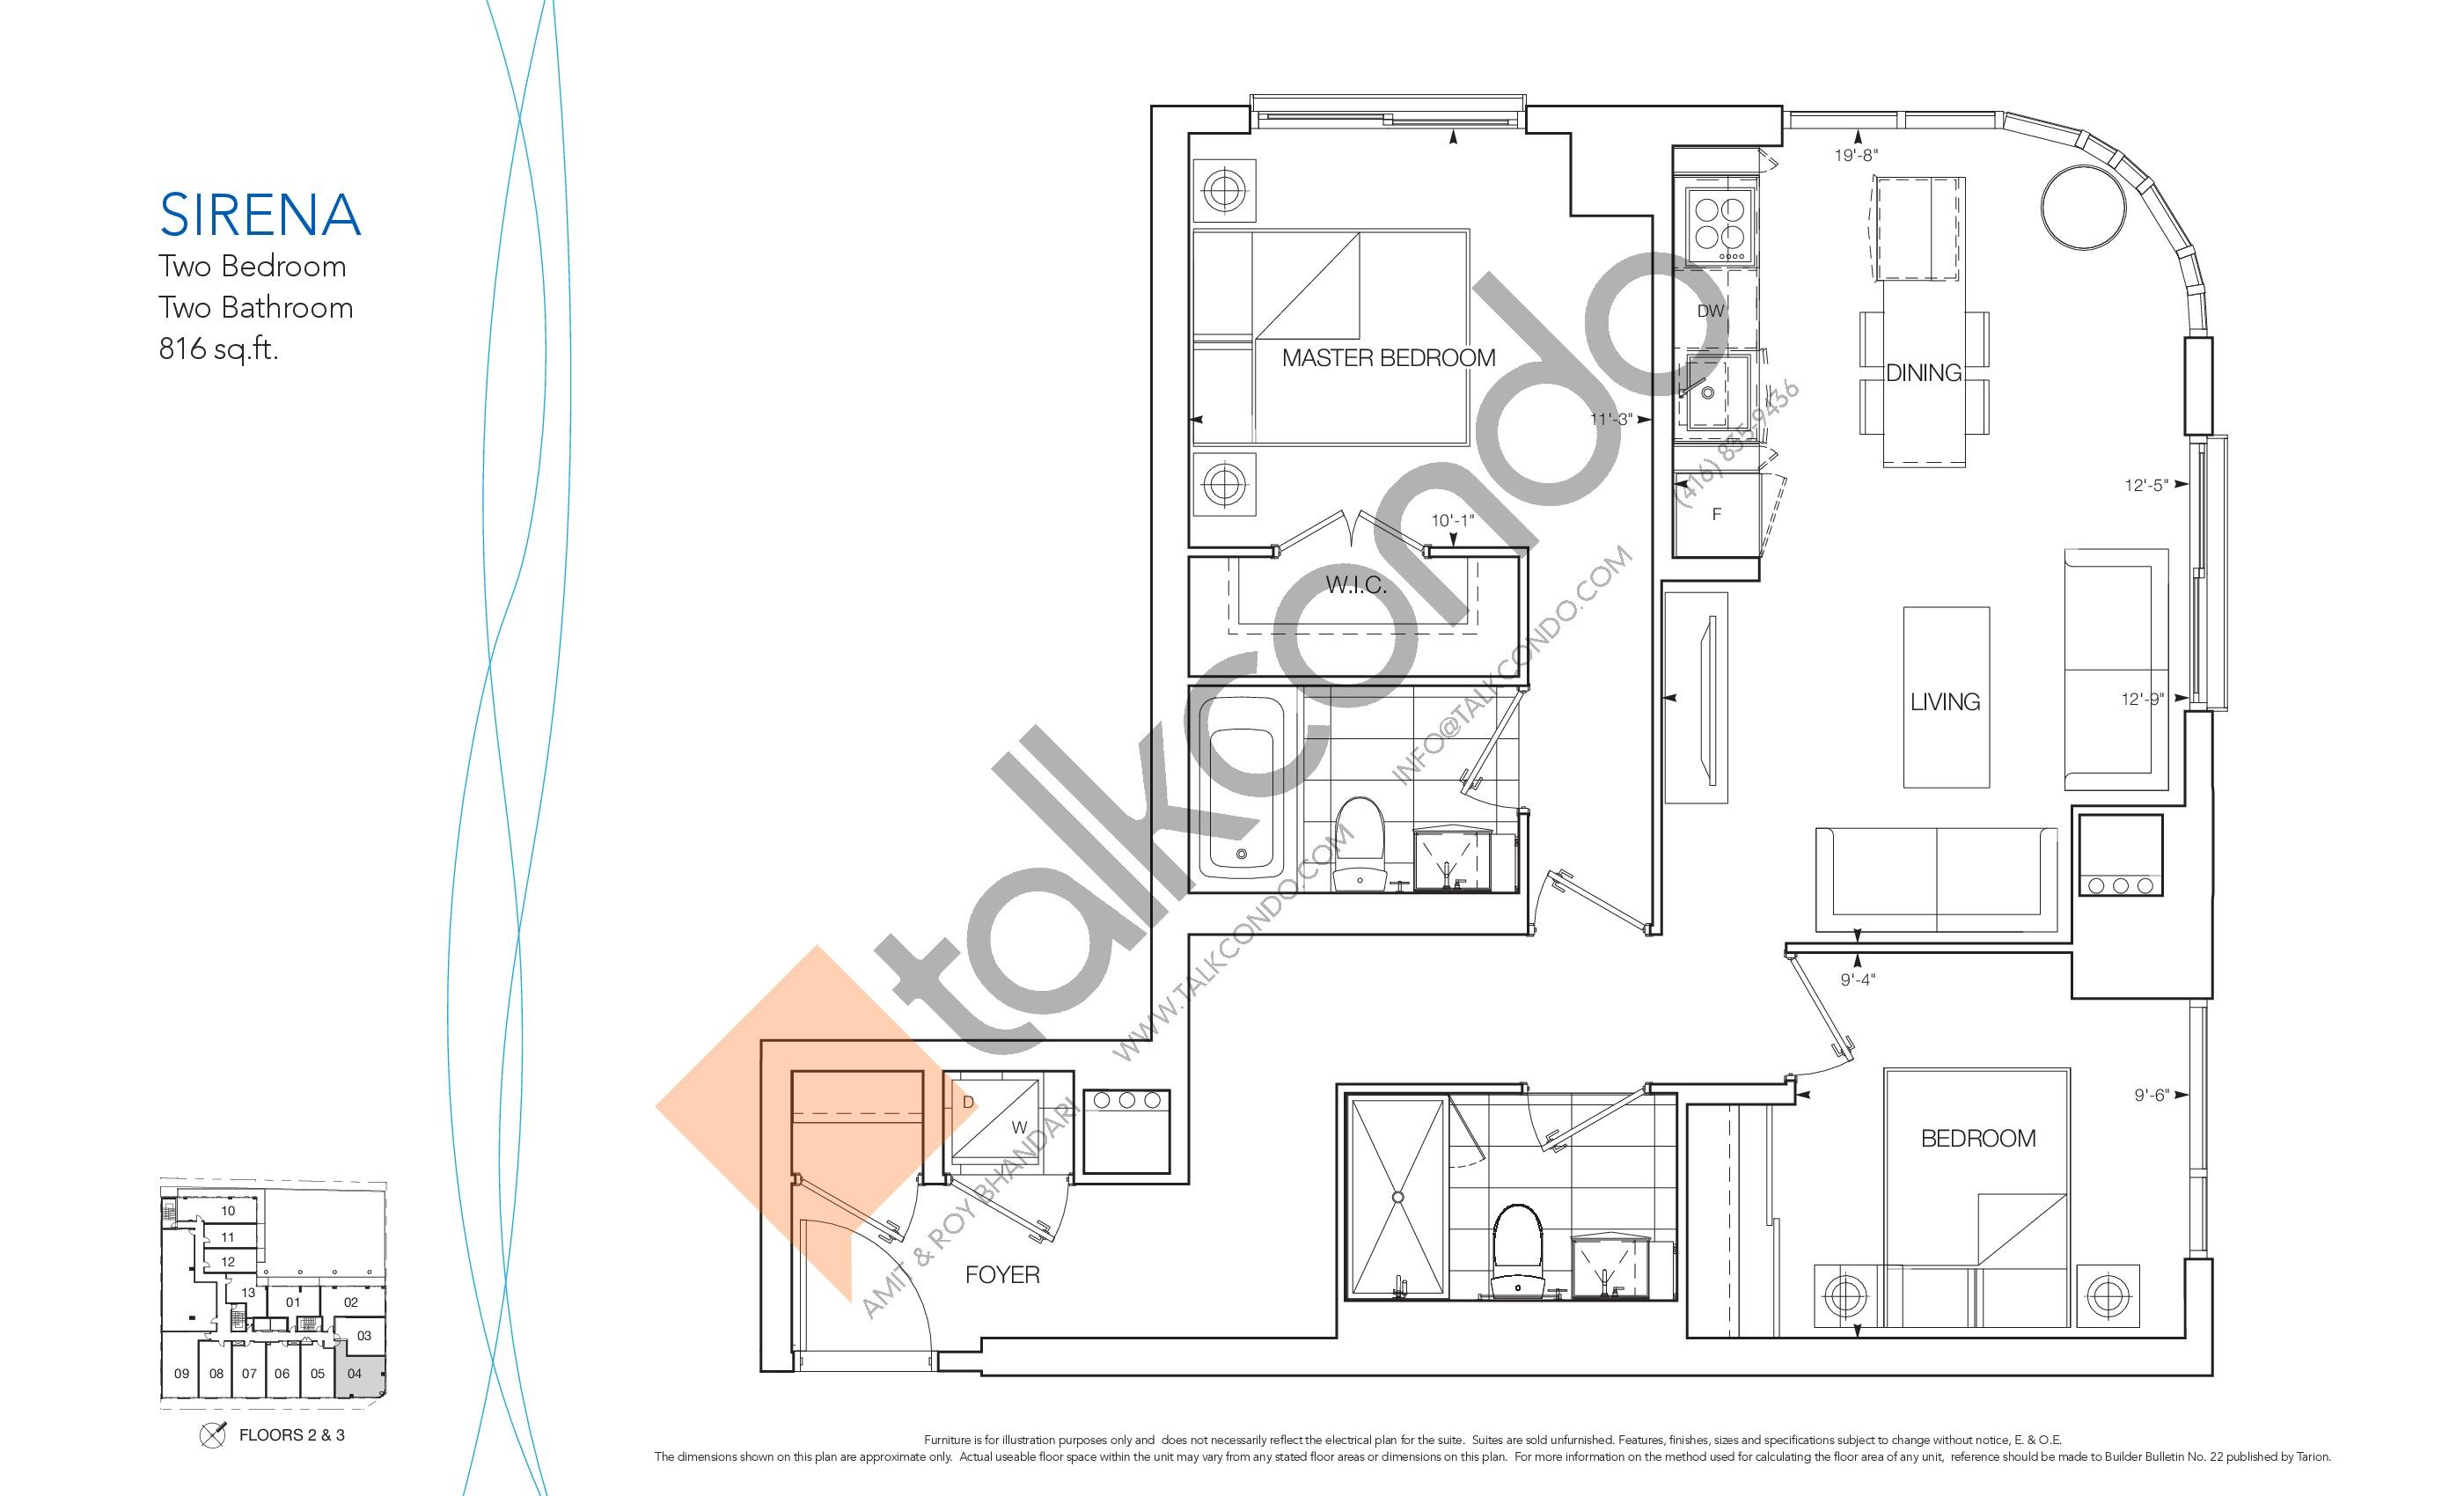 Sirena Floor Plan at Nautique Lakefront Residences - 816 sq.ft